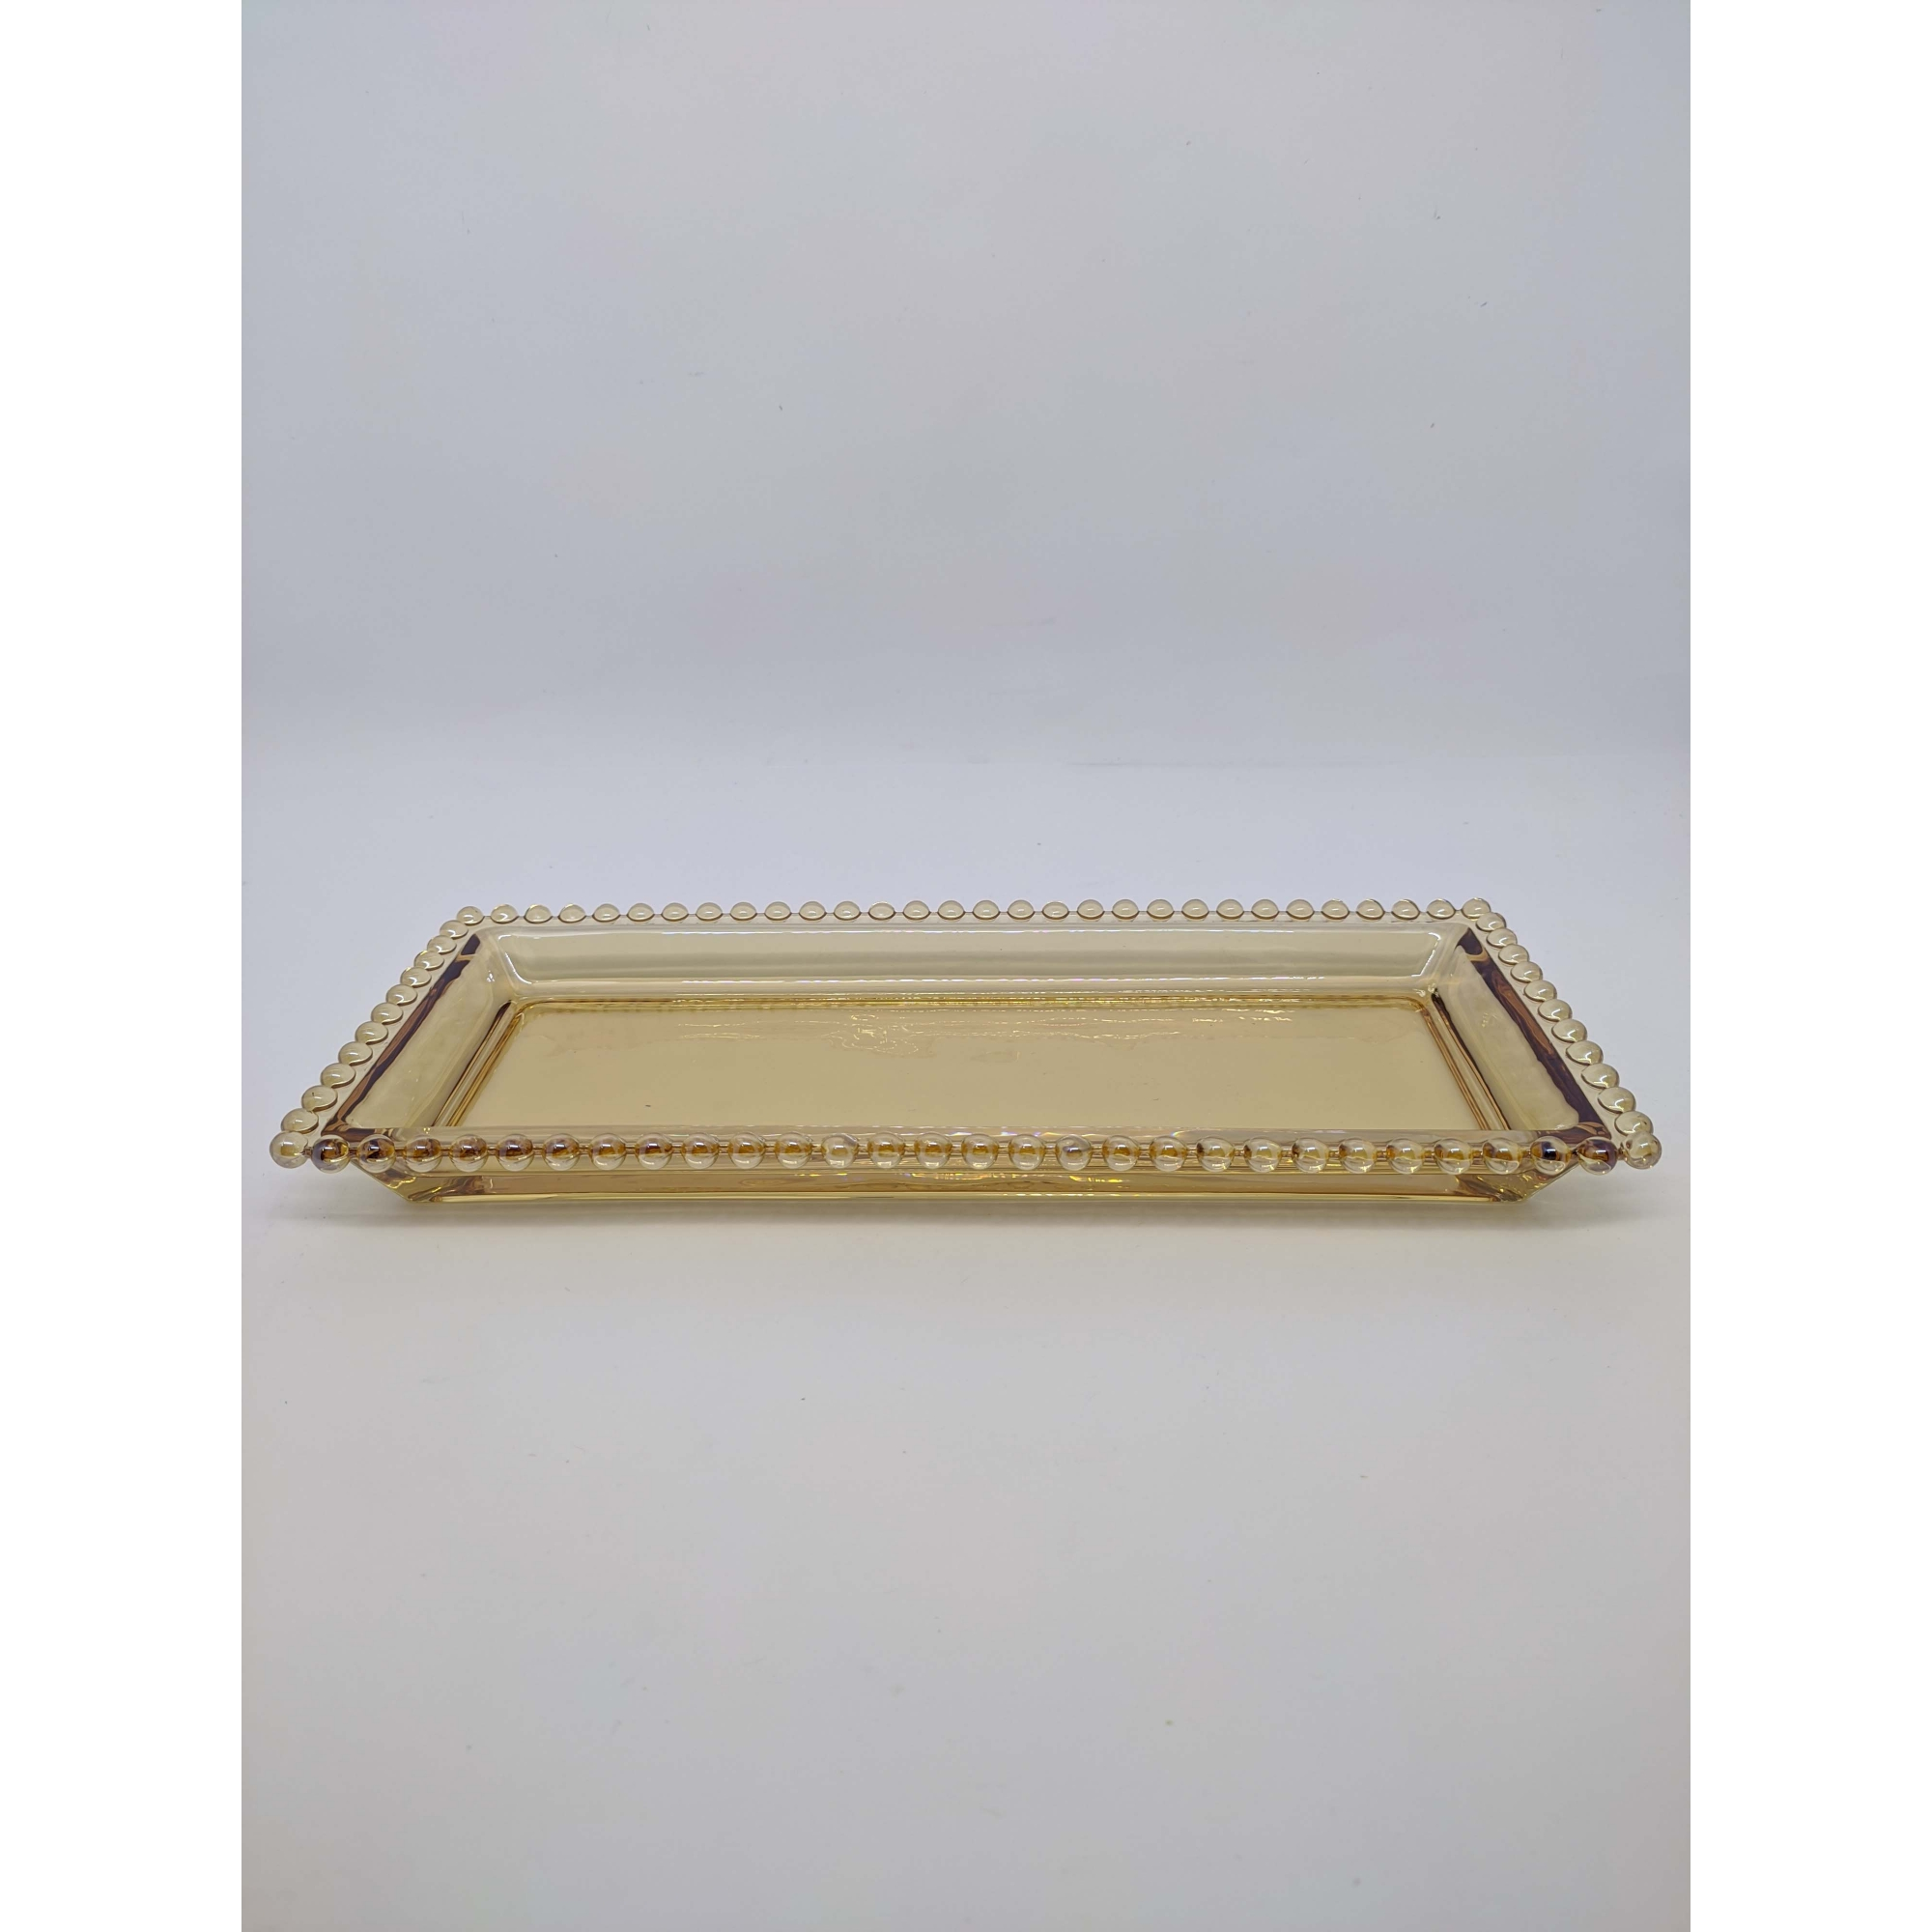 Travessa Cristal de Chumbo Pearl Ambar 30x13x3cm